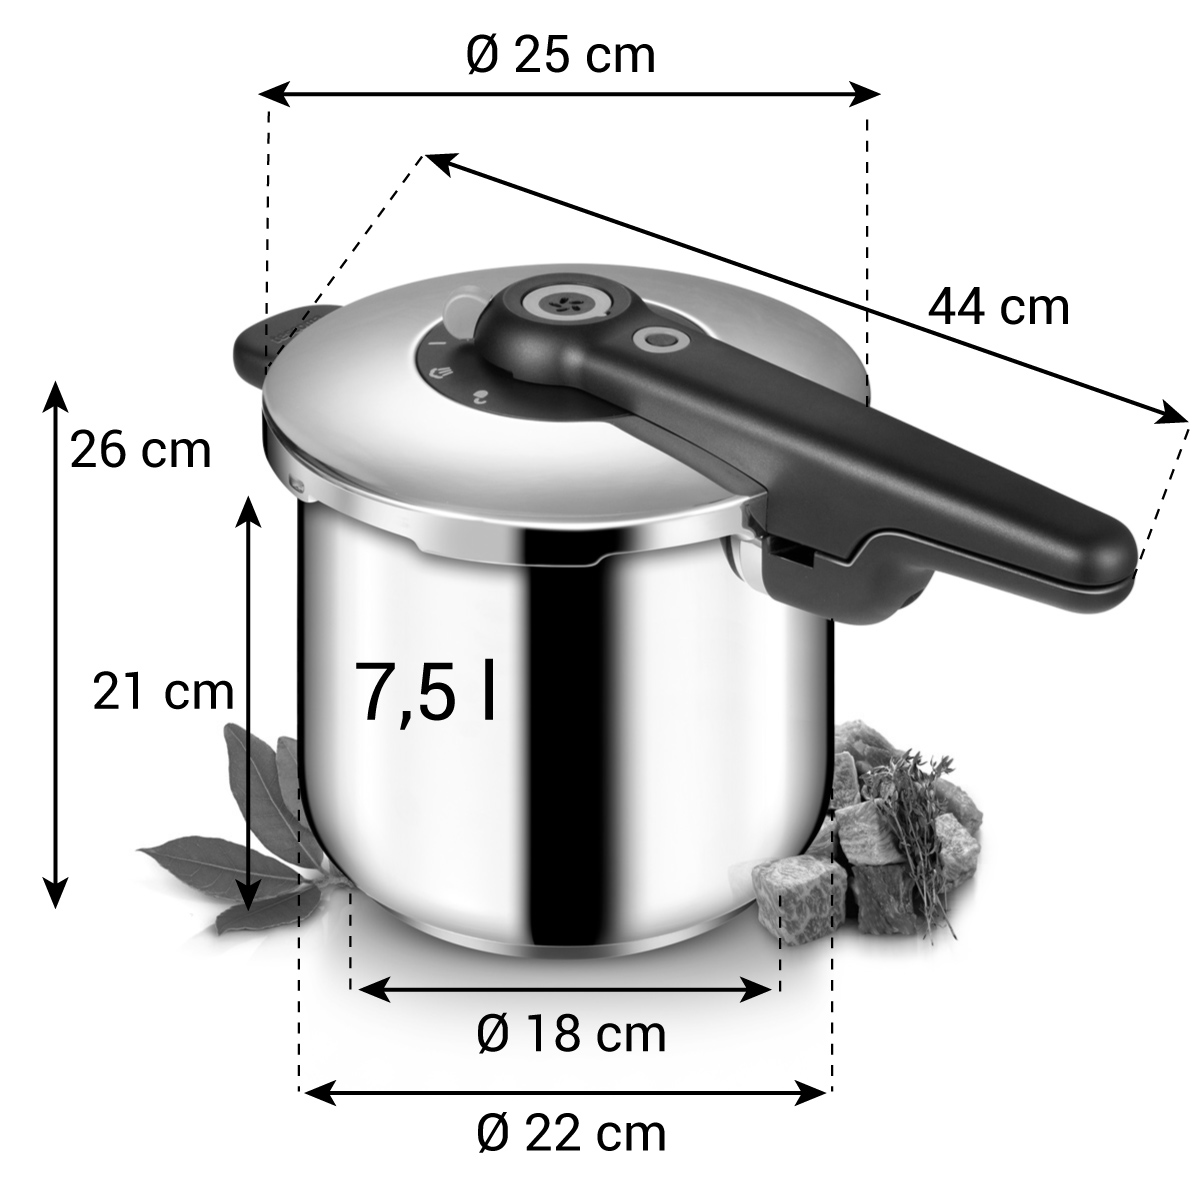 Tlakový hrnec SmartCLICK 7,5 l